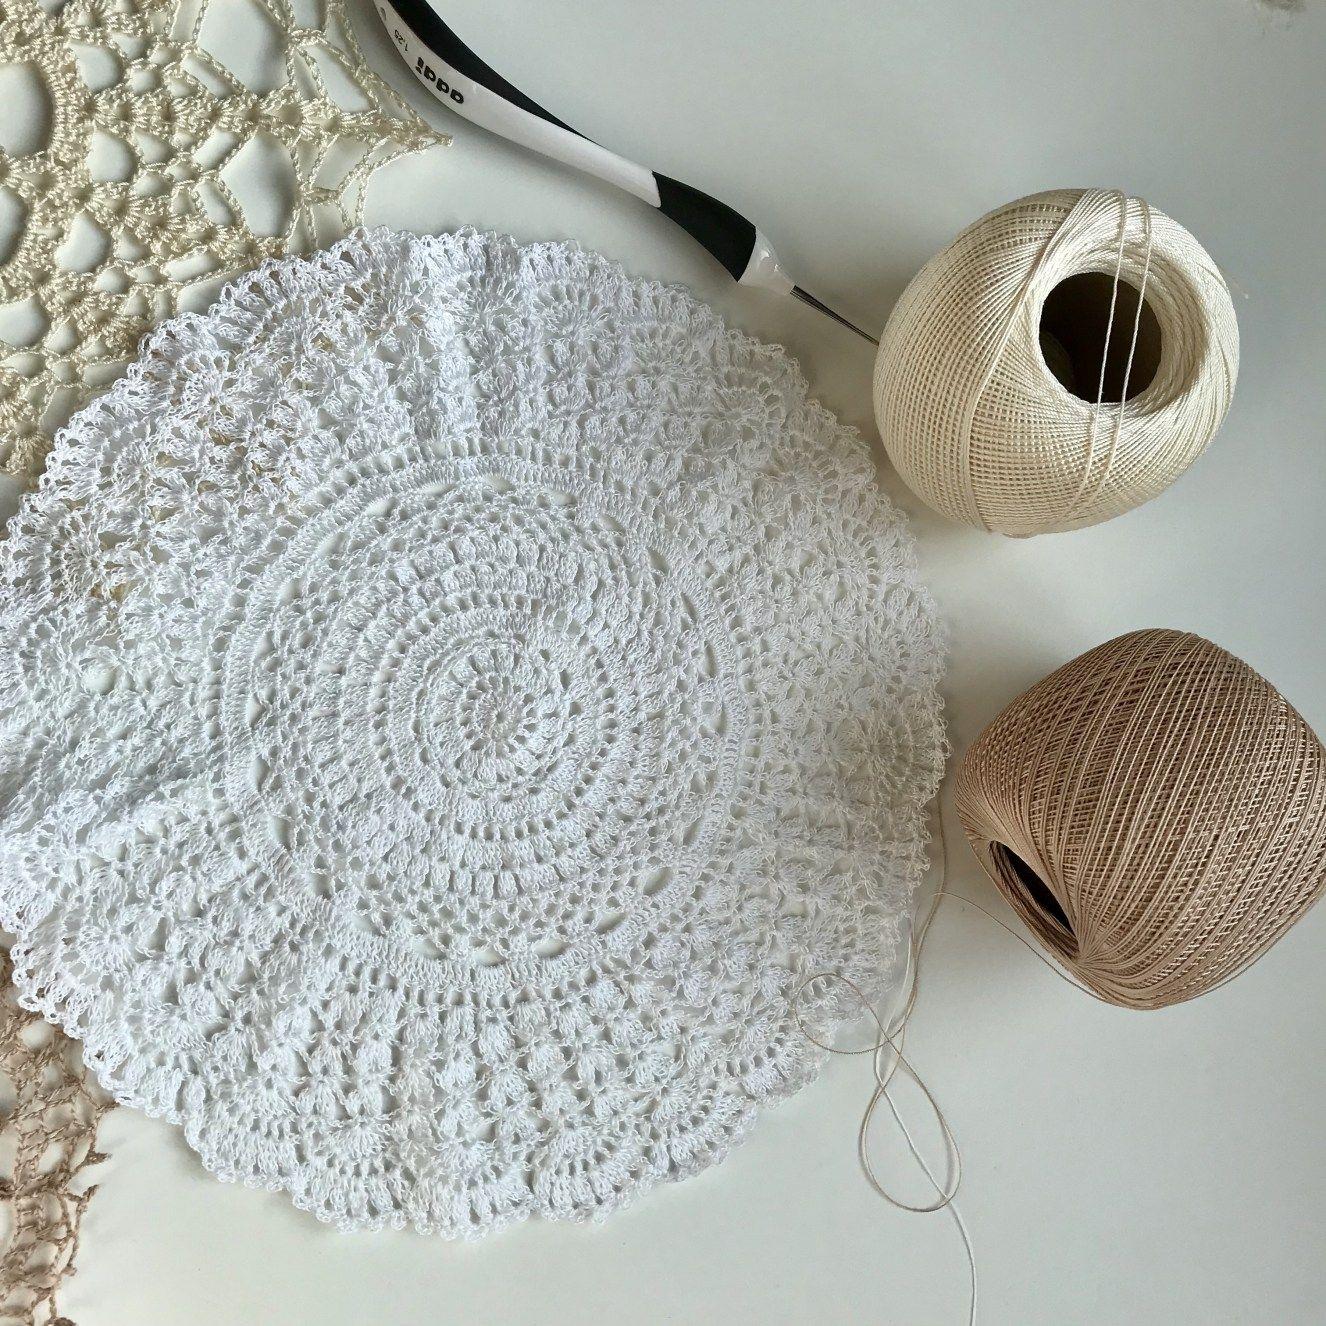 Five free Crochet Doily Patterns | Agrraderas y carpetas | Pinterest ...